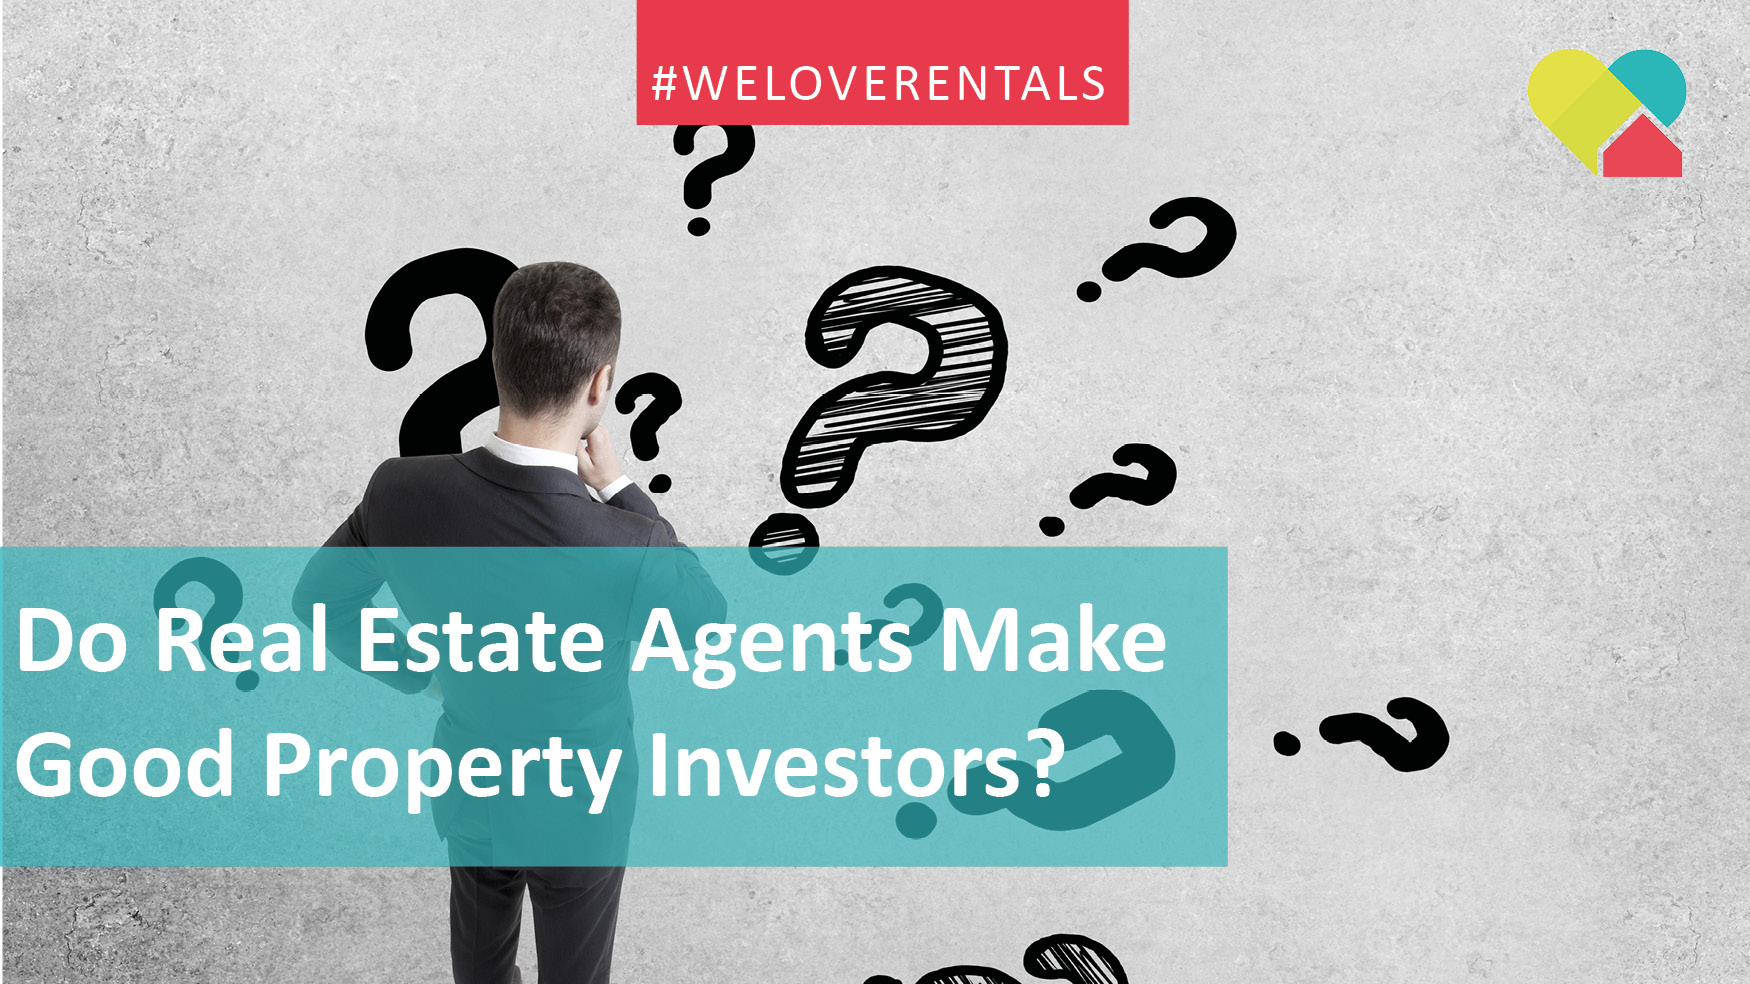 We Love Rentals Do Real Estate Agents Make Good Property Investors